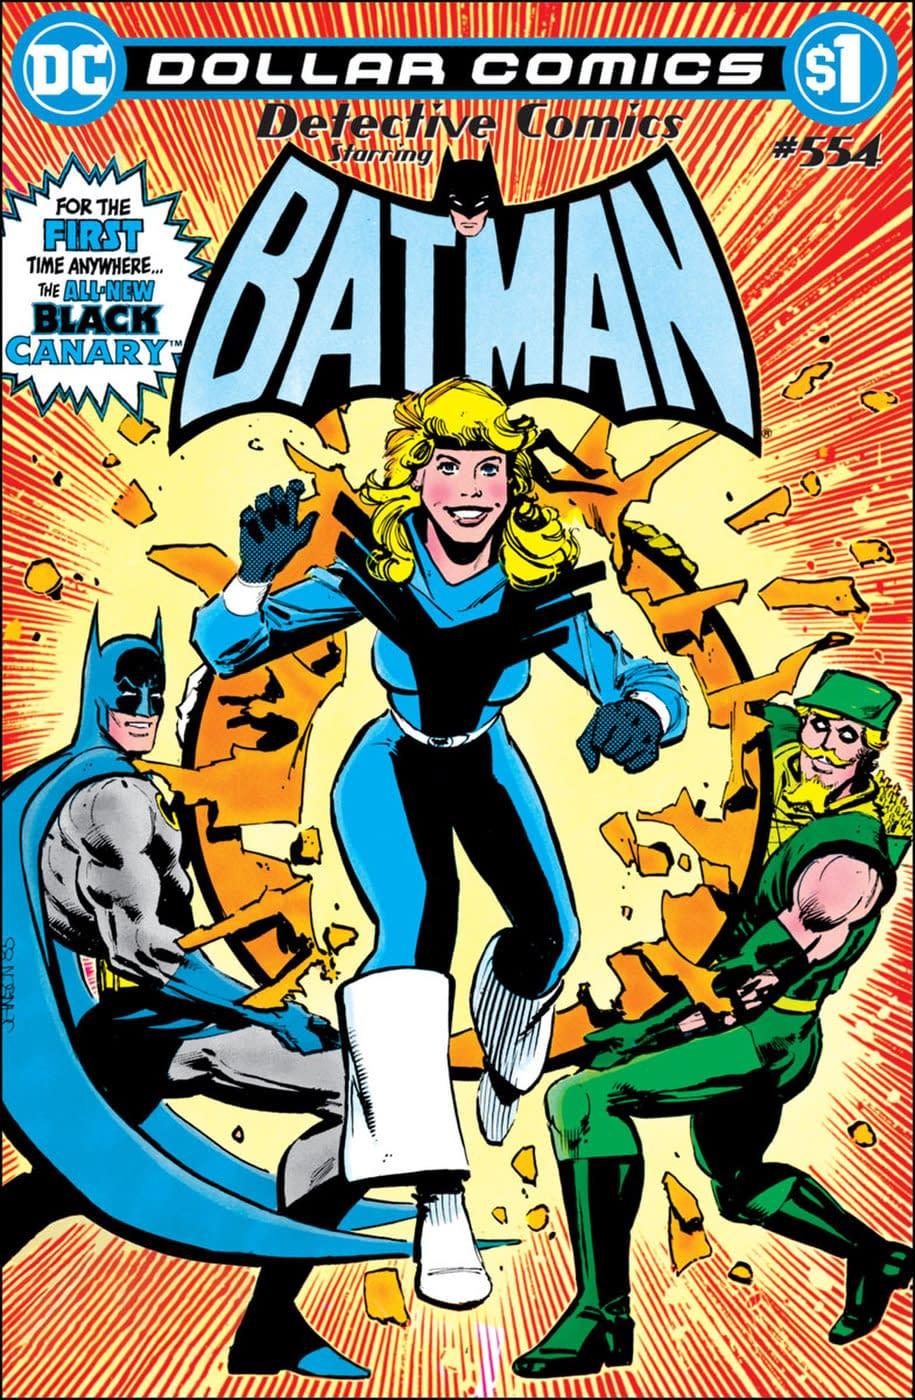 Wonder Woman #750 Leads DC Comics January 2020 Solicitations